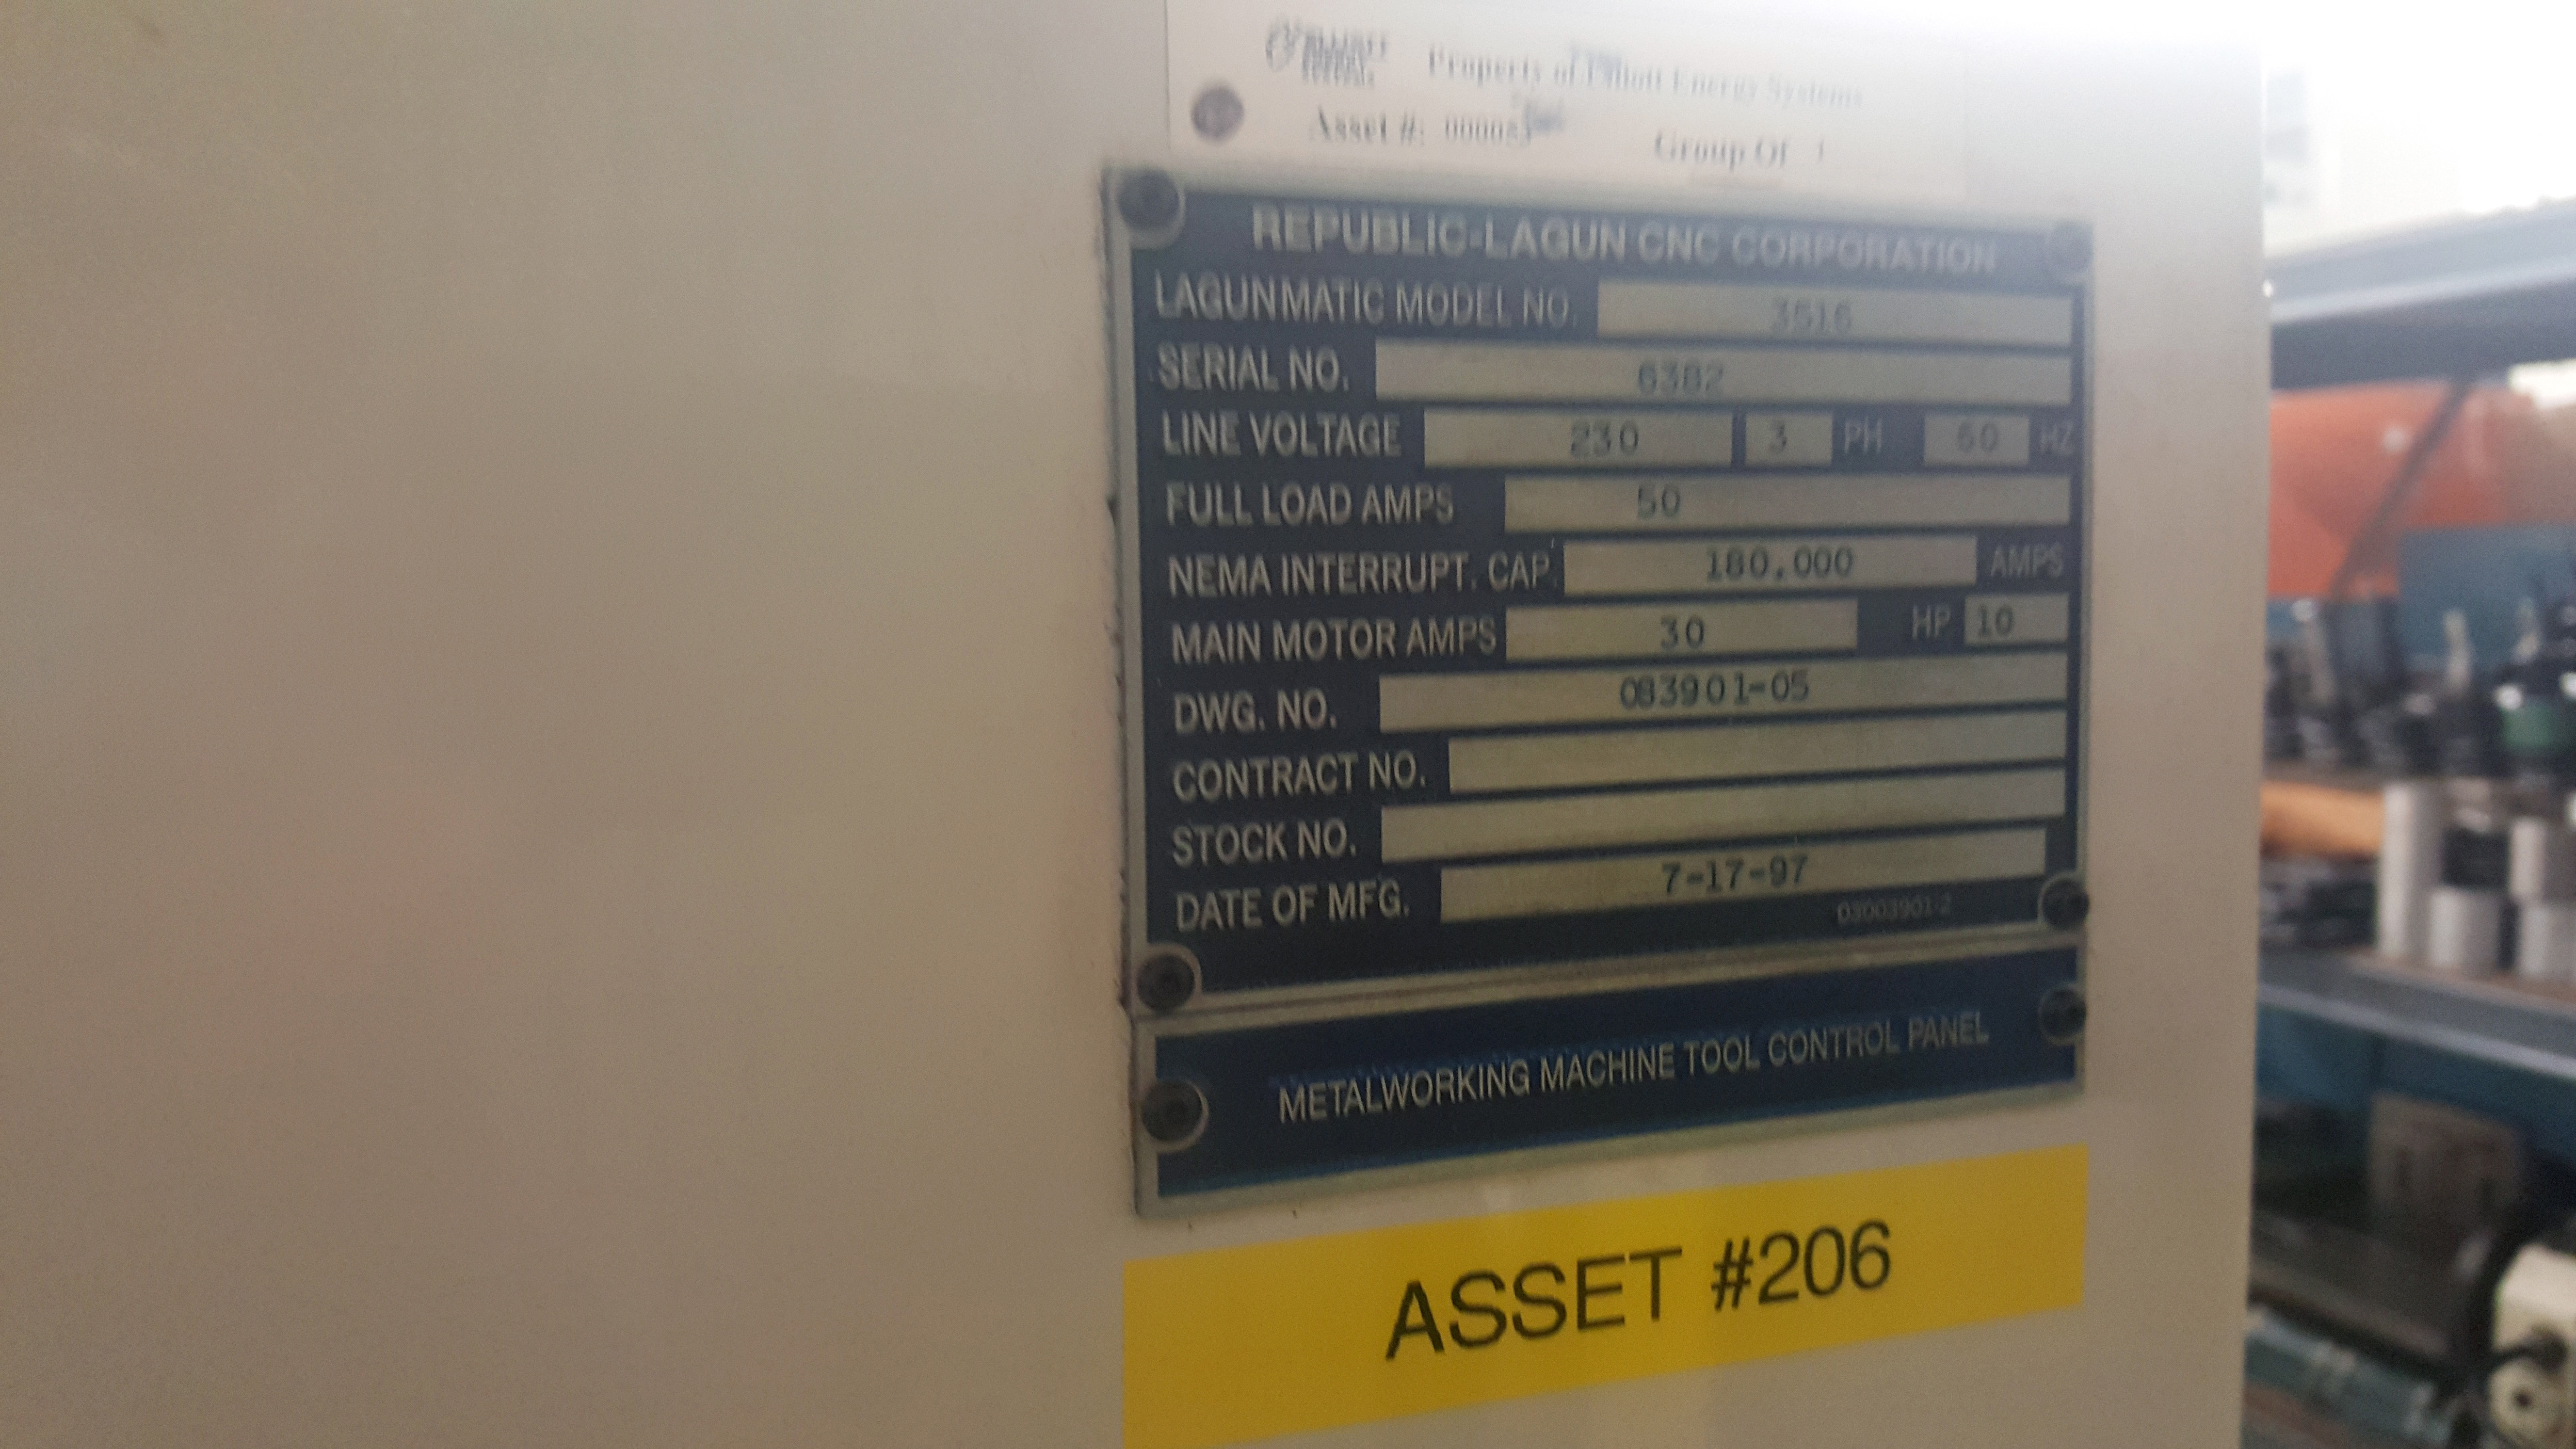 "Republic Lagun 4 Axis Model 3516 CNC Vertical Machining Center 16"" X 35"" table, 18 tools, 5000 - Image 5 of 6"